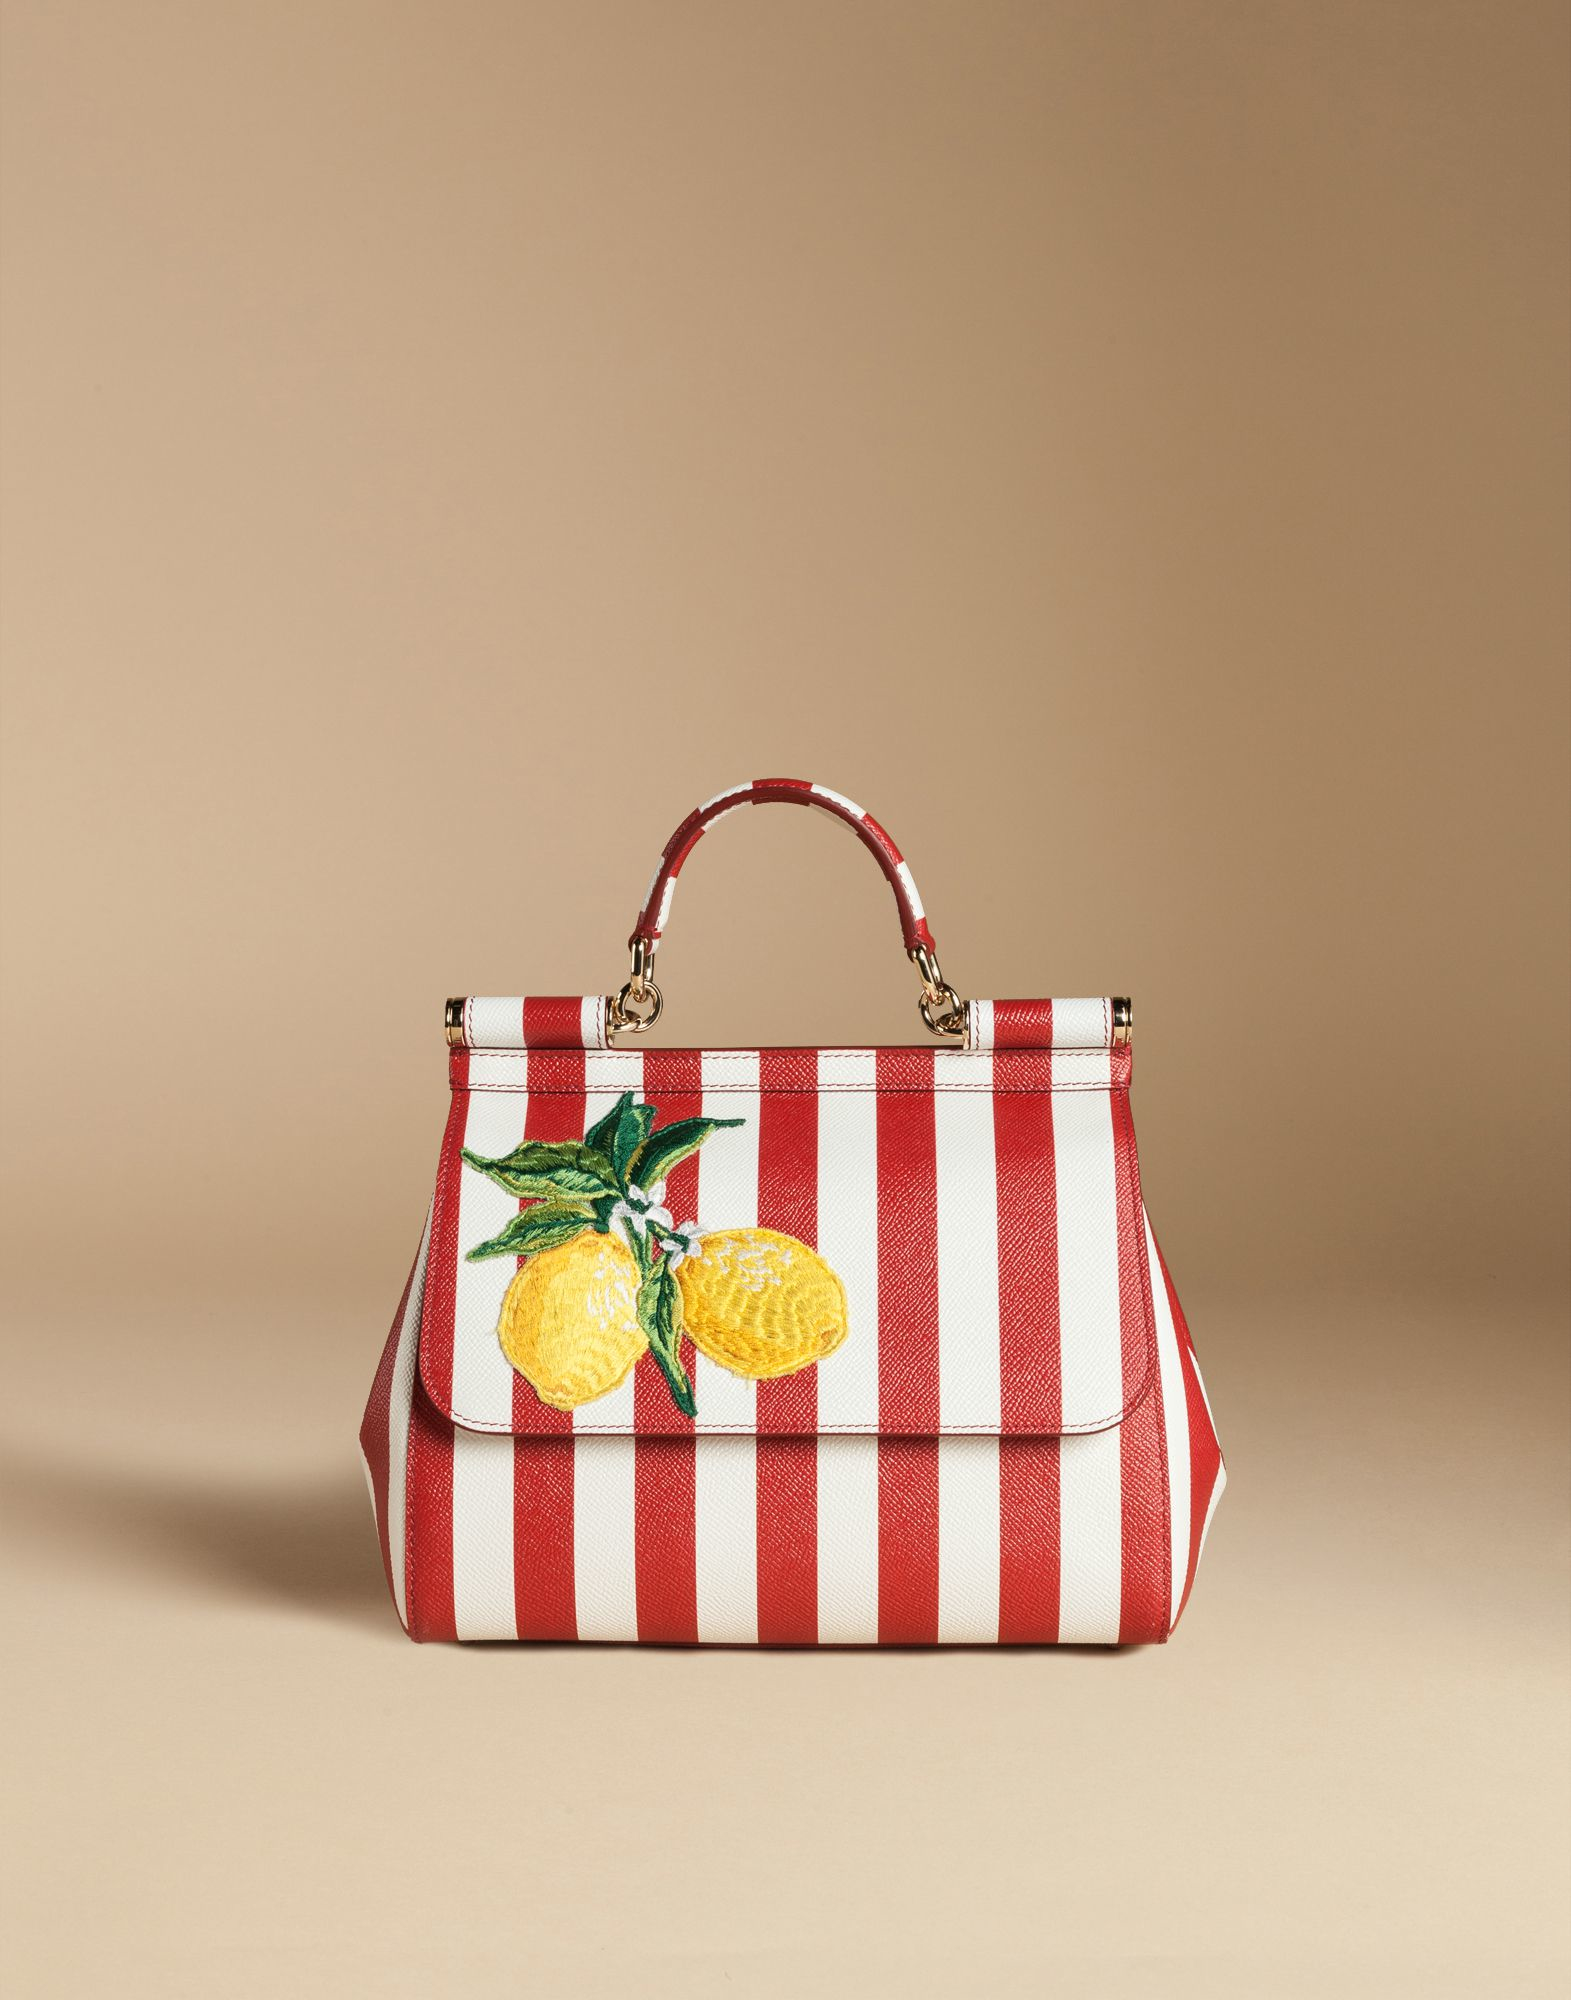 5b2fc5f98fe6 Lyst - Dolce   Gabbana Medium Sicily Bag In Printed Dauphine Leather ...